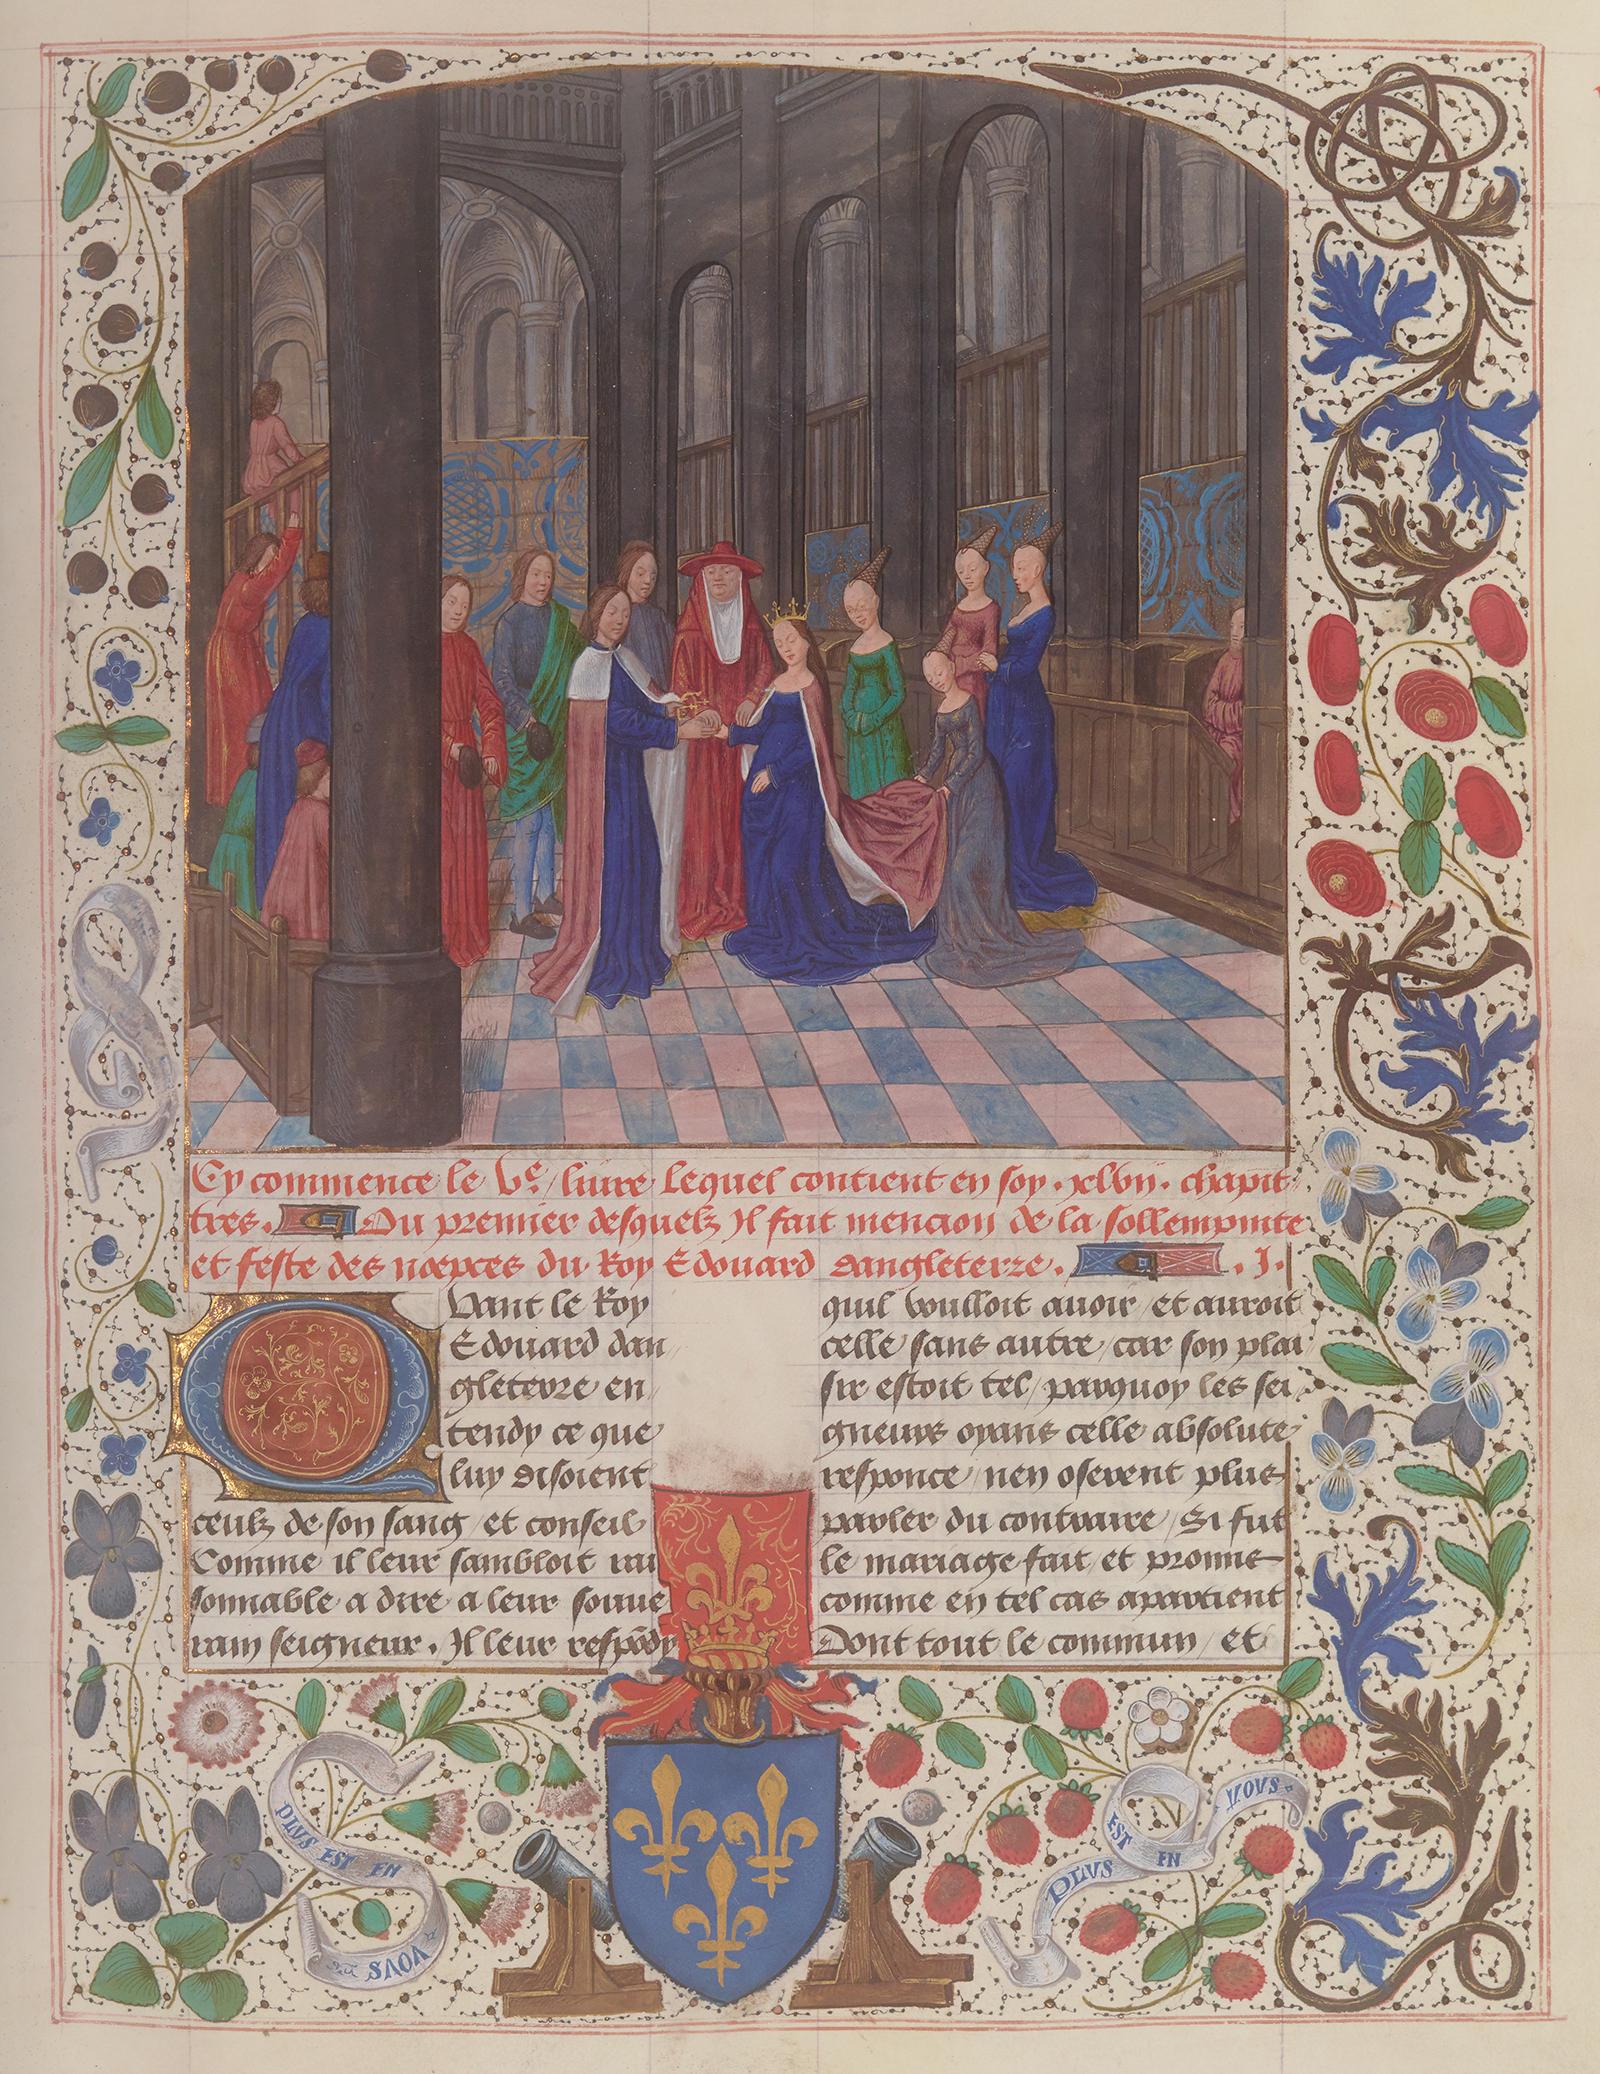 Marriage_Edward_IV_Elizabeth_Woodville_Wavrin_Anciennes_Chroniques_d'Angleterre_Francais_85_f109_web.jpg